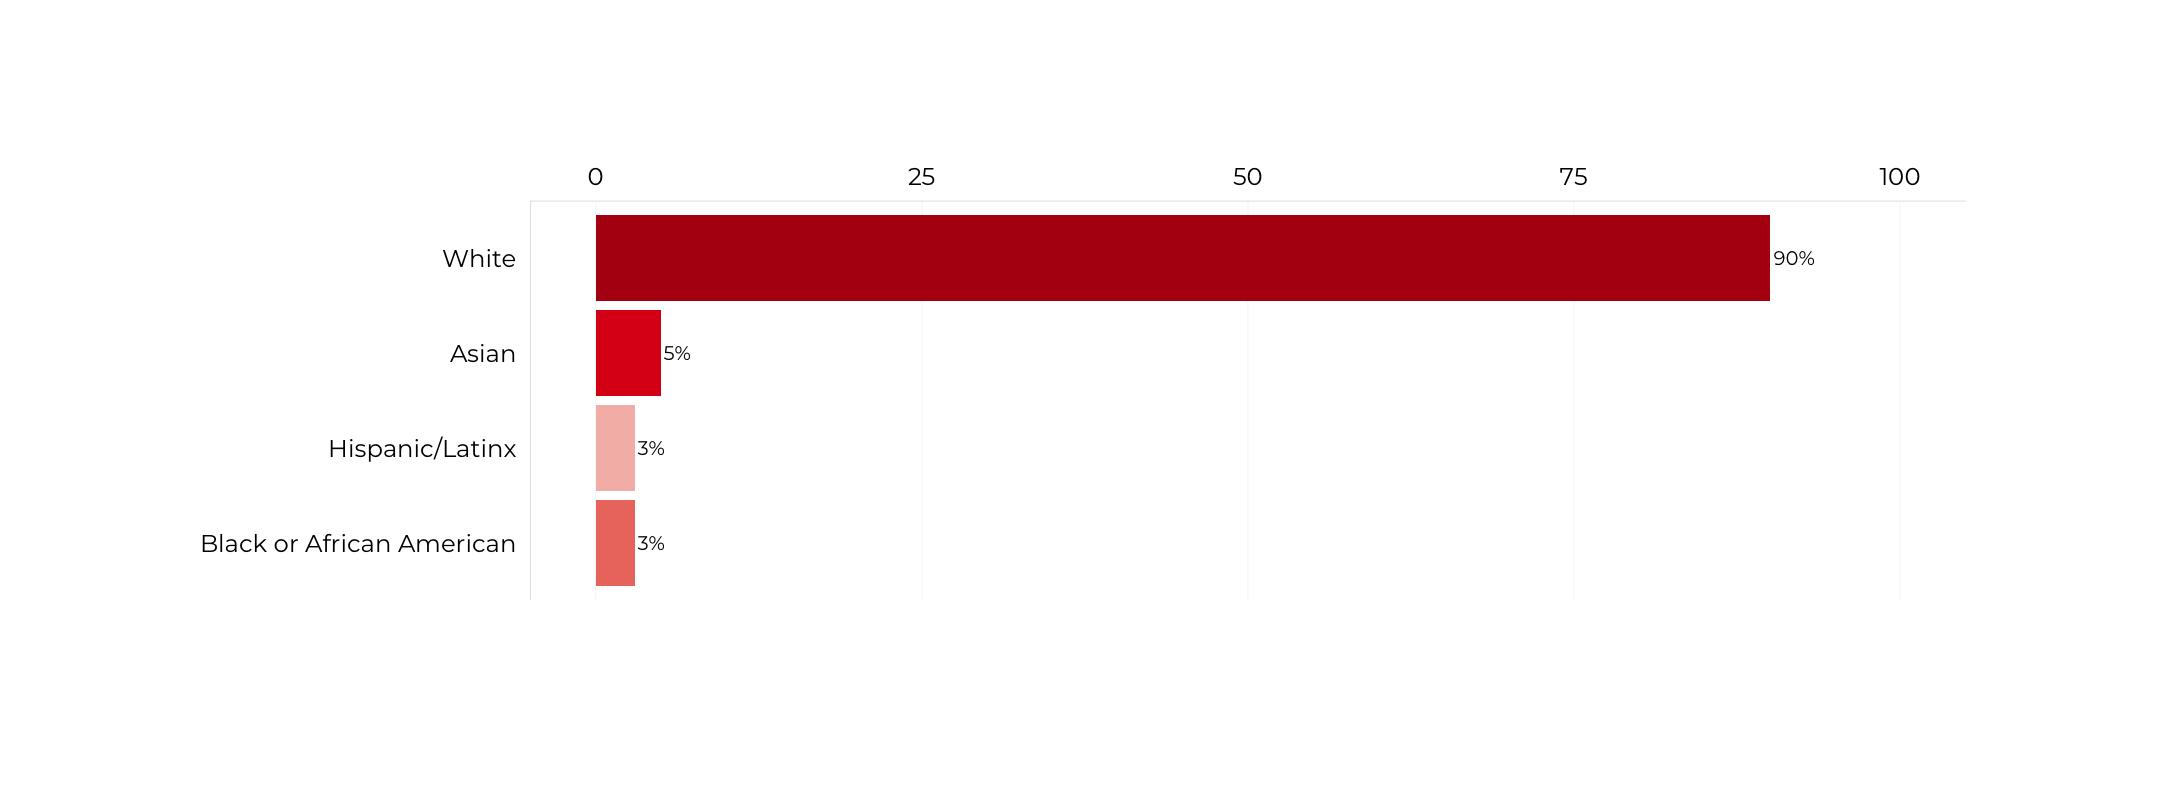 Graph about Racial Composition of Secretaries of Commerce. More detailed text description below.